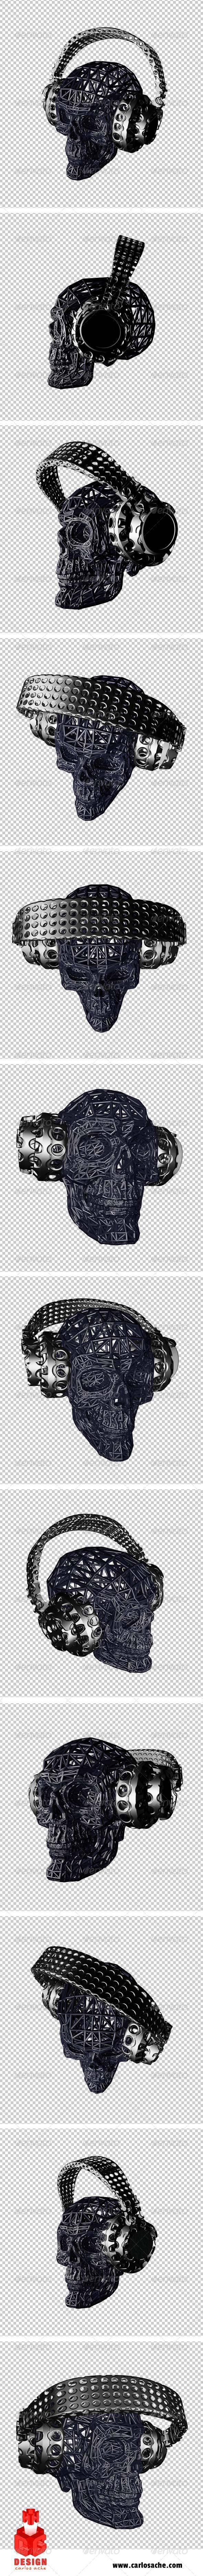 GraphicRiver Skulls Dj's Twelve Views 7440346